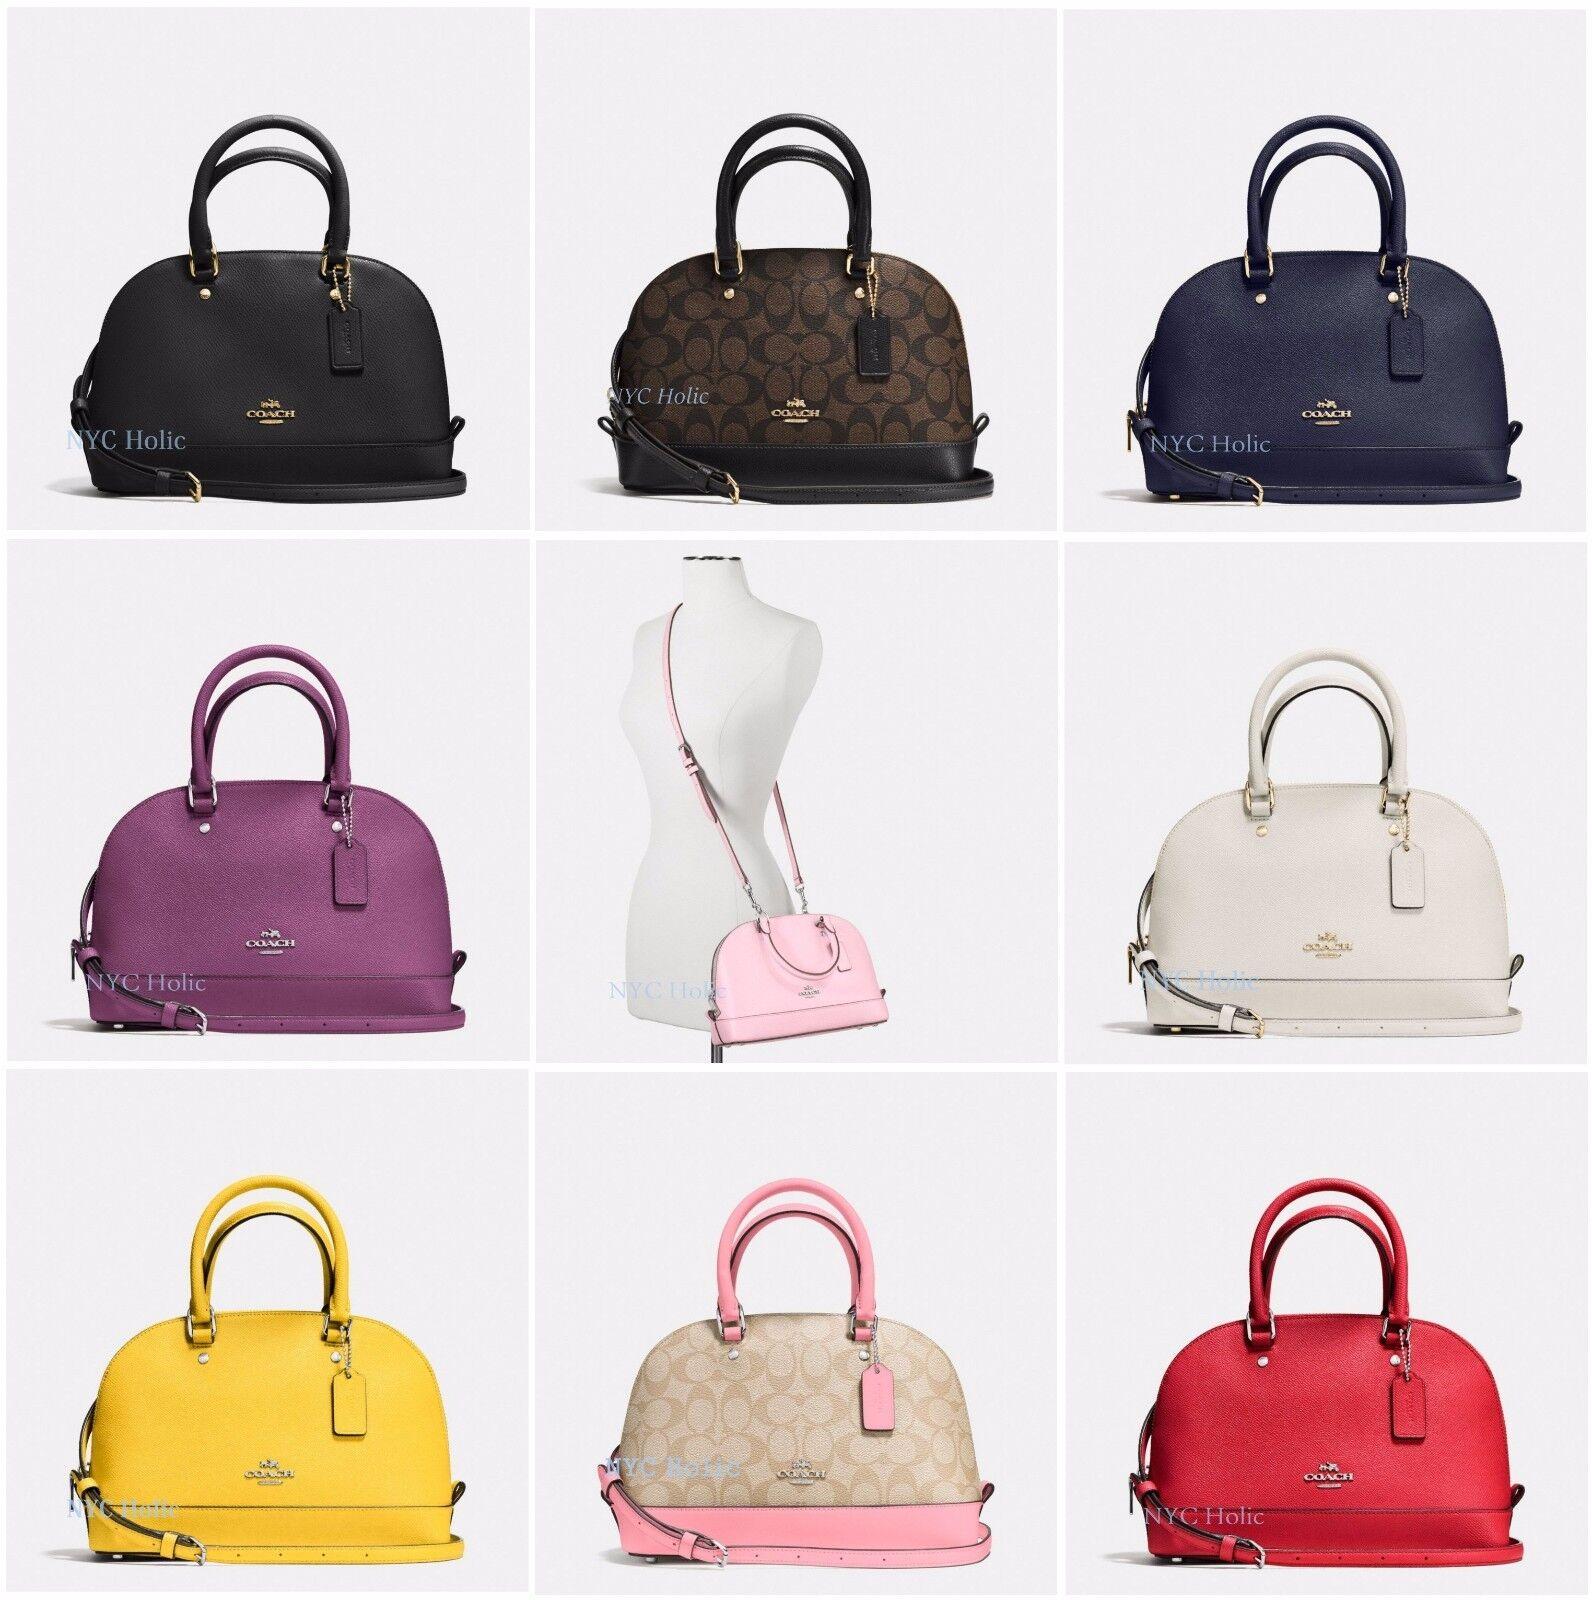 2035290f0 ... signature mini kelsey satchel crossbody bag khaki brown shoes 62288  d3c71; uk new coach f27583 f27591 f37232 mini sierra satchel dome ebay  1c083 27897